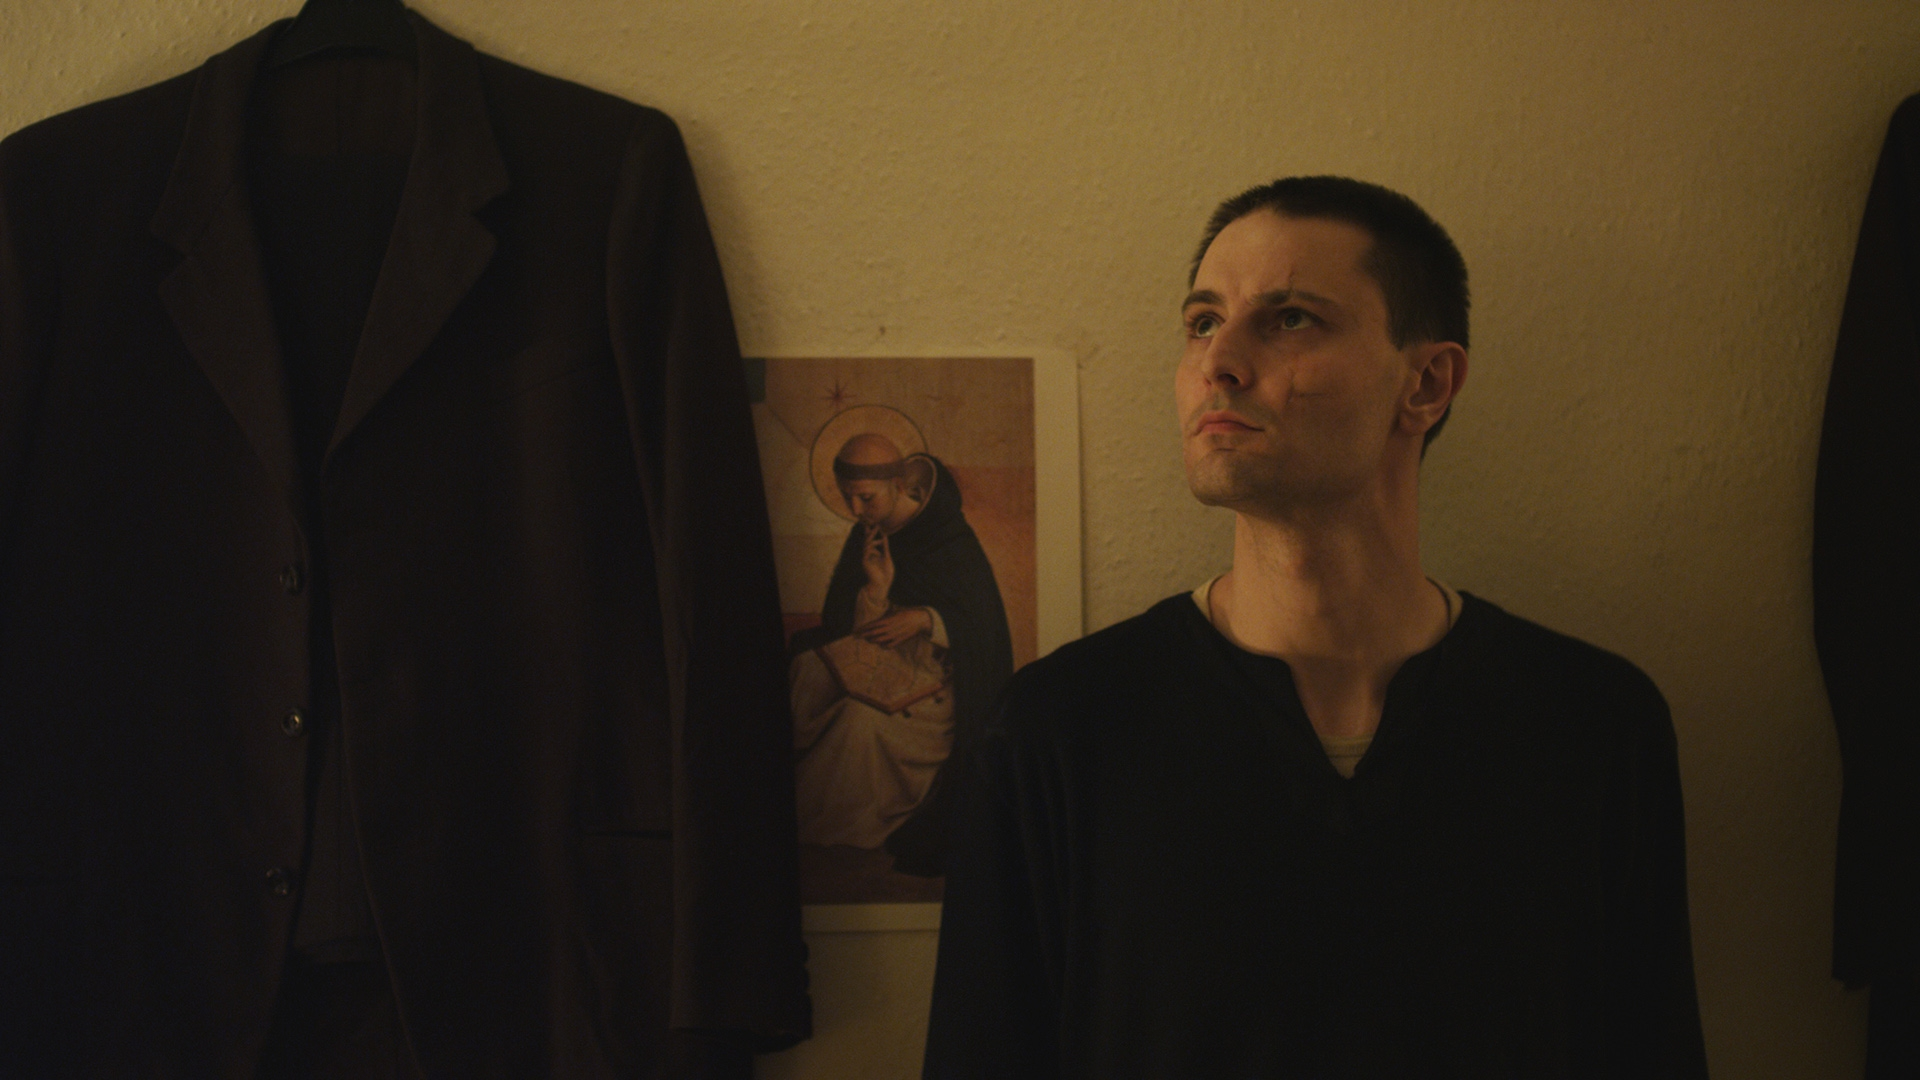 Onirica: Michal Tatarek in una scena tratta dal film